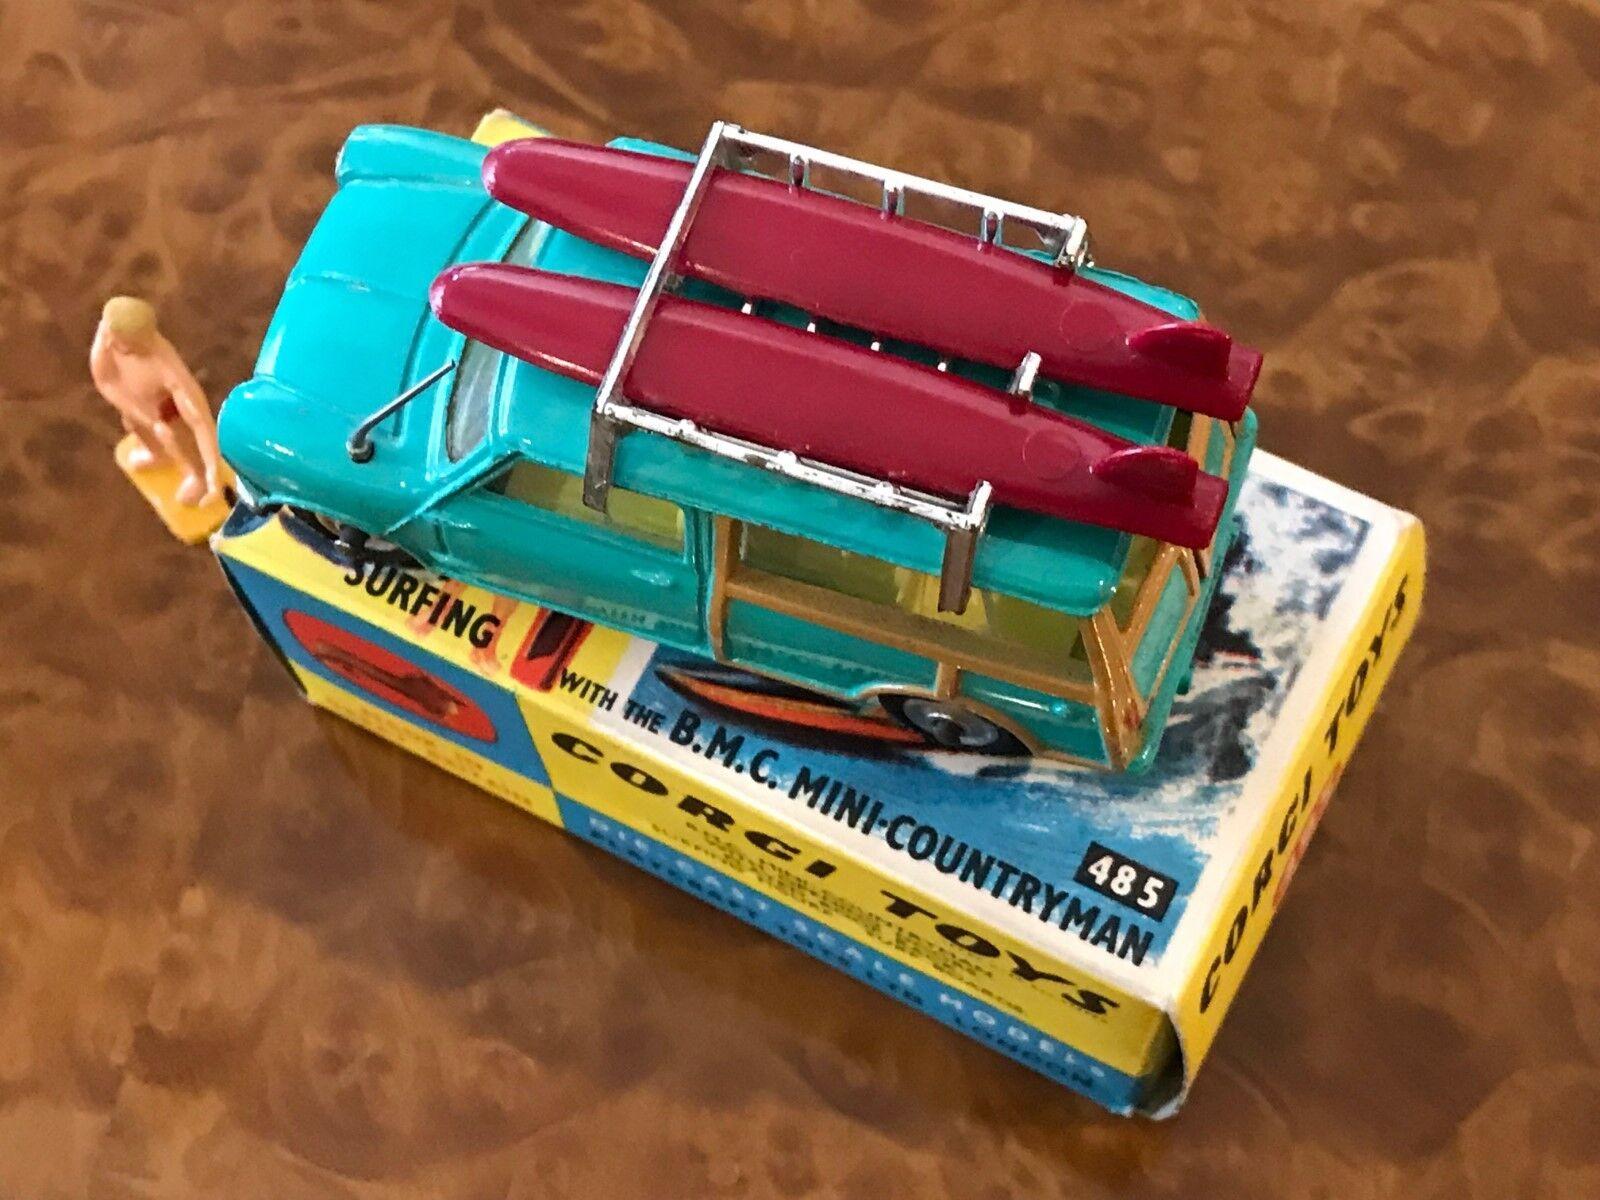 Vintage Corgi Toys MIB BMC BMC BMC Mini Countryman mit   Surfen Feilen & Fig. No. 485  | Ruf zuerst  e83a9b